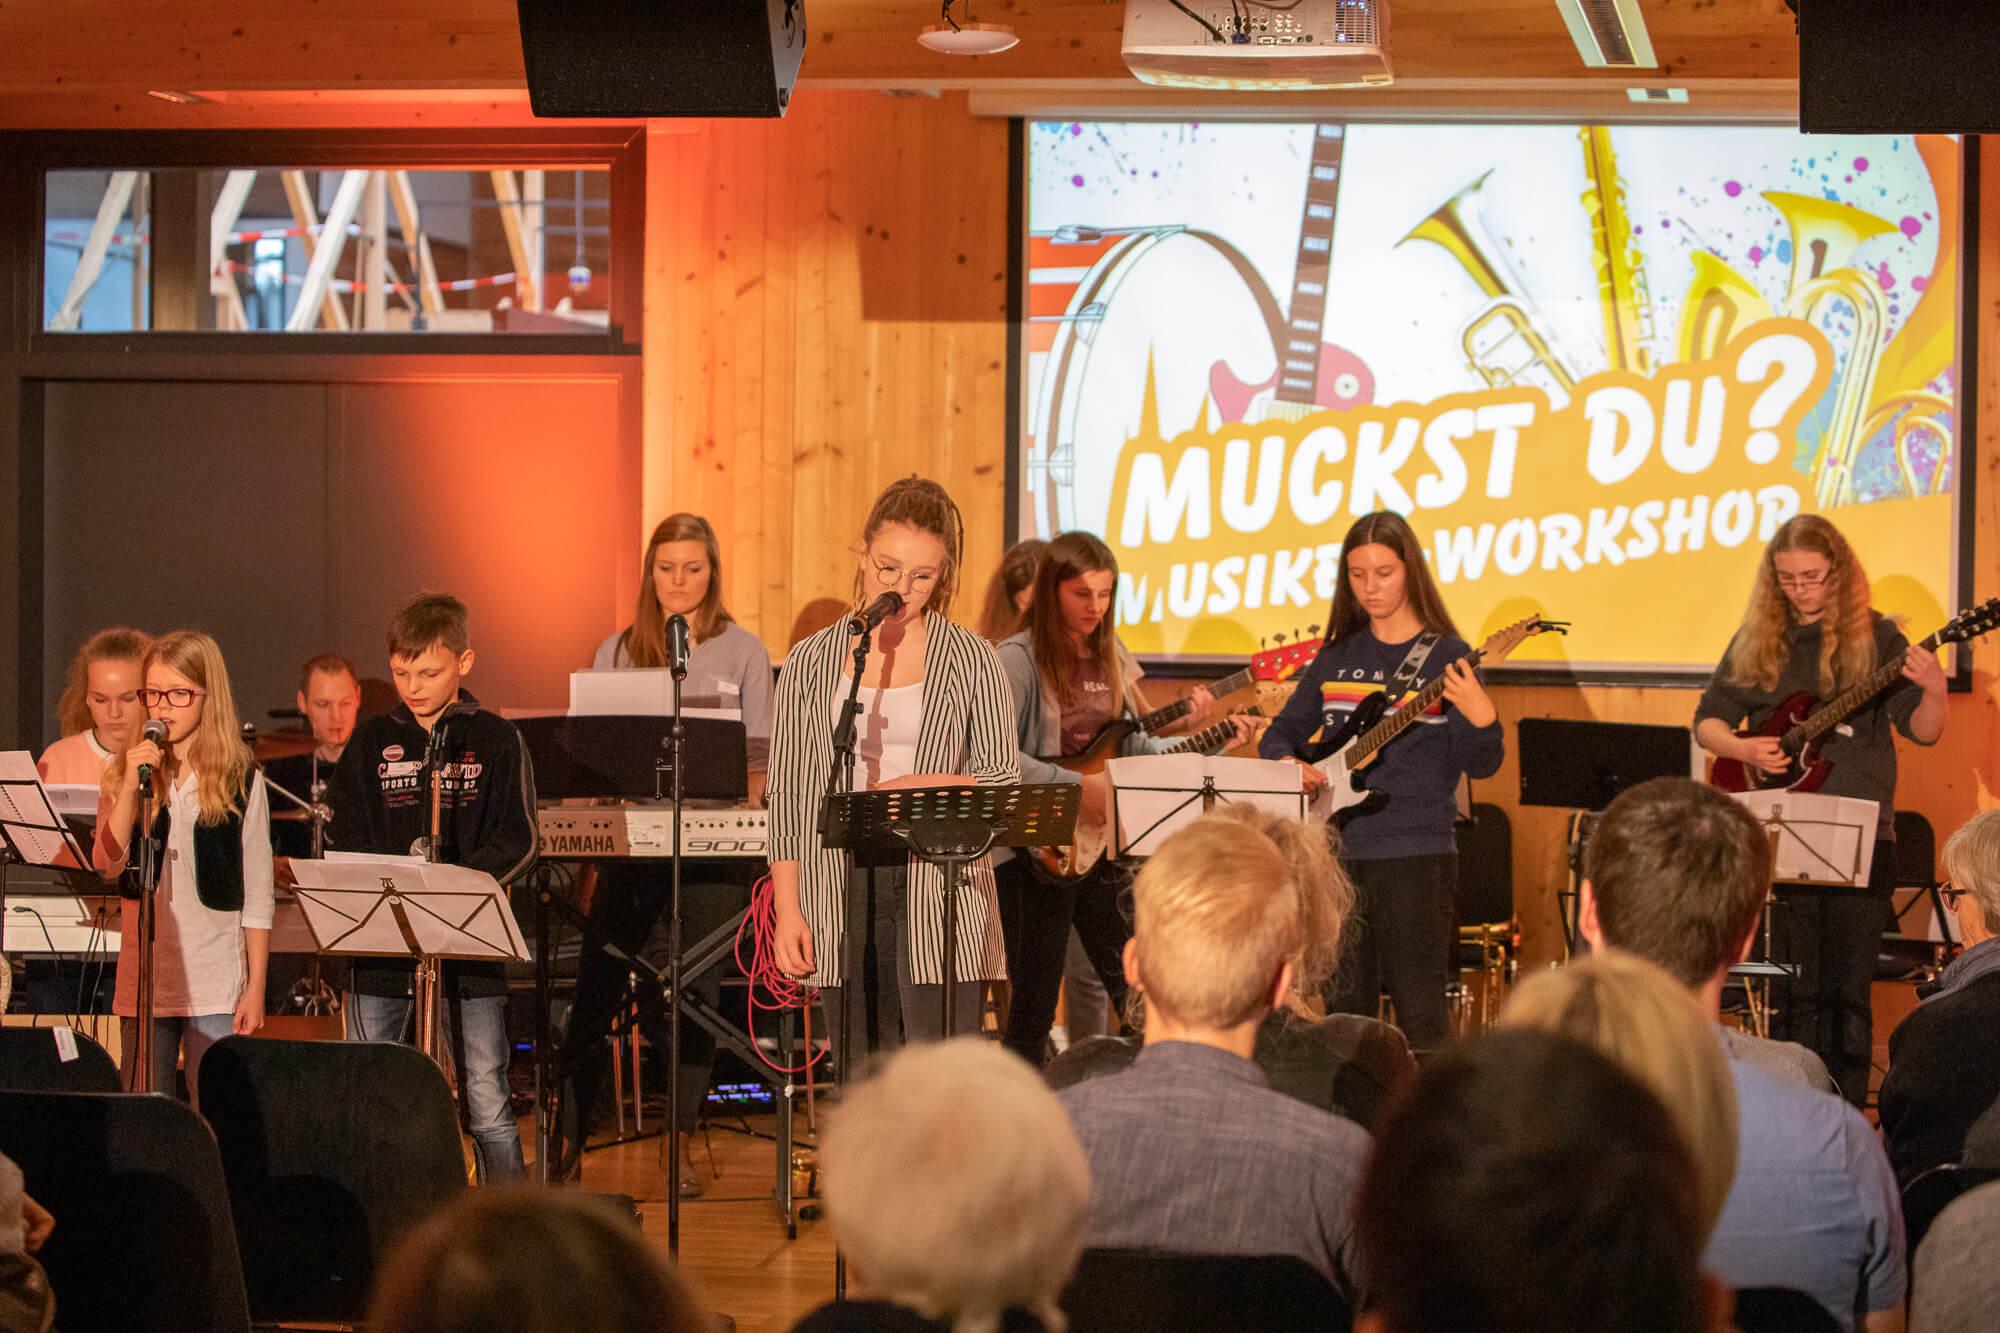 Muckst Du Musiker-Workshop Olsberg Musikschule PK-Media